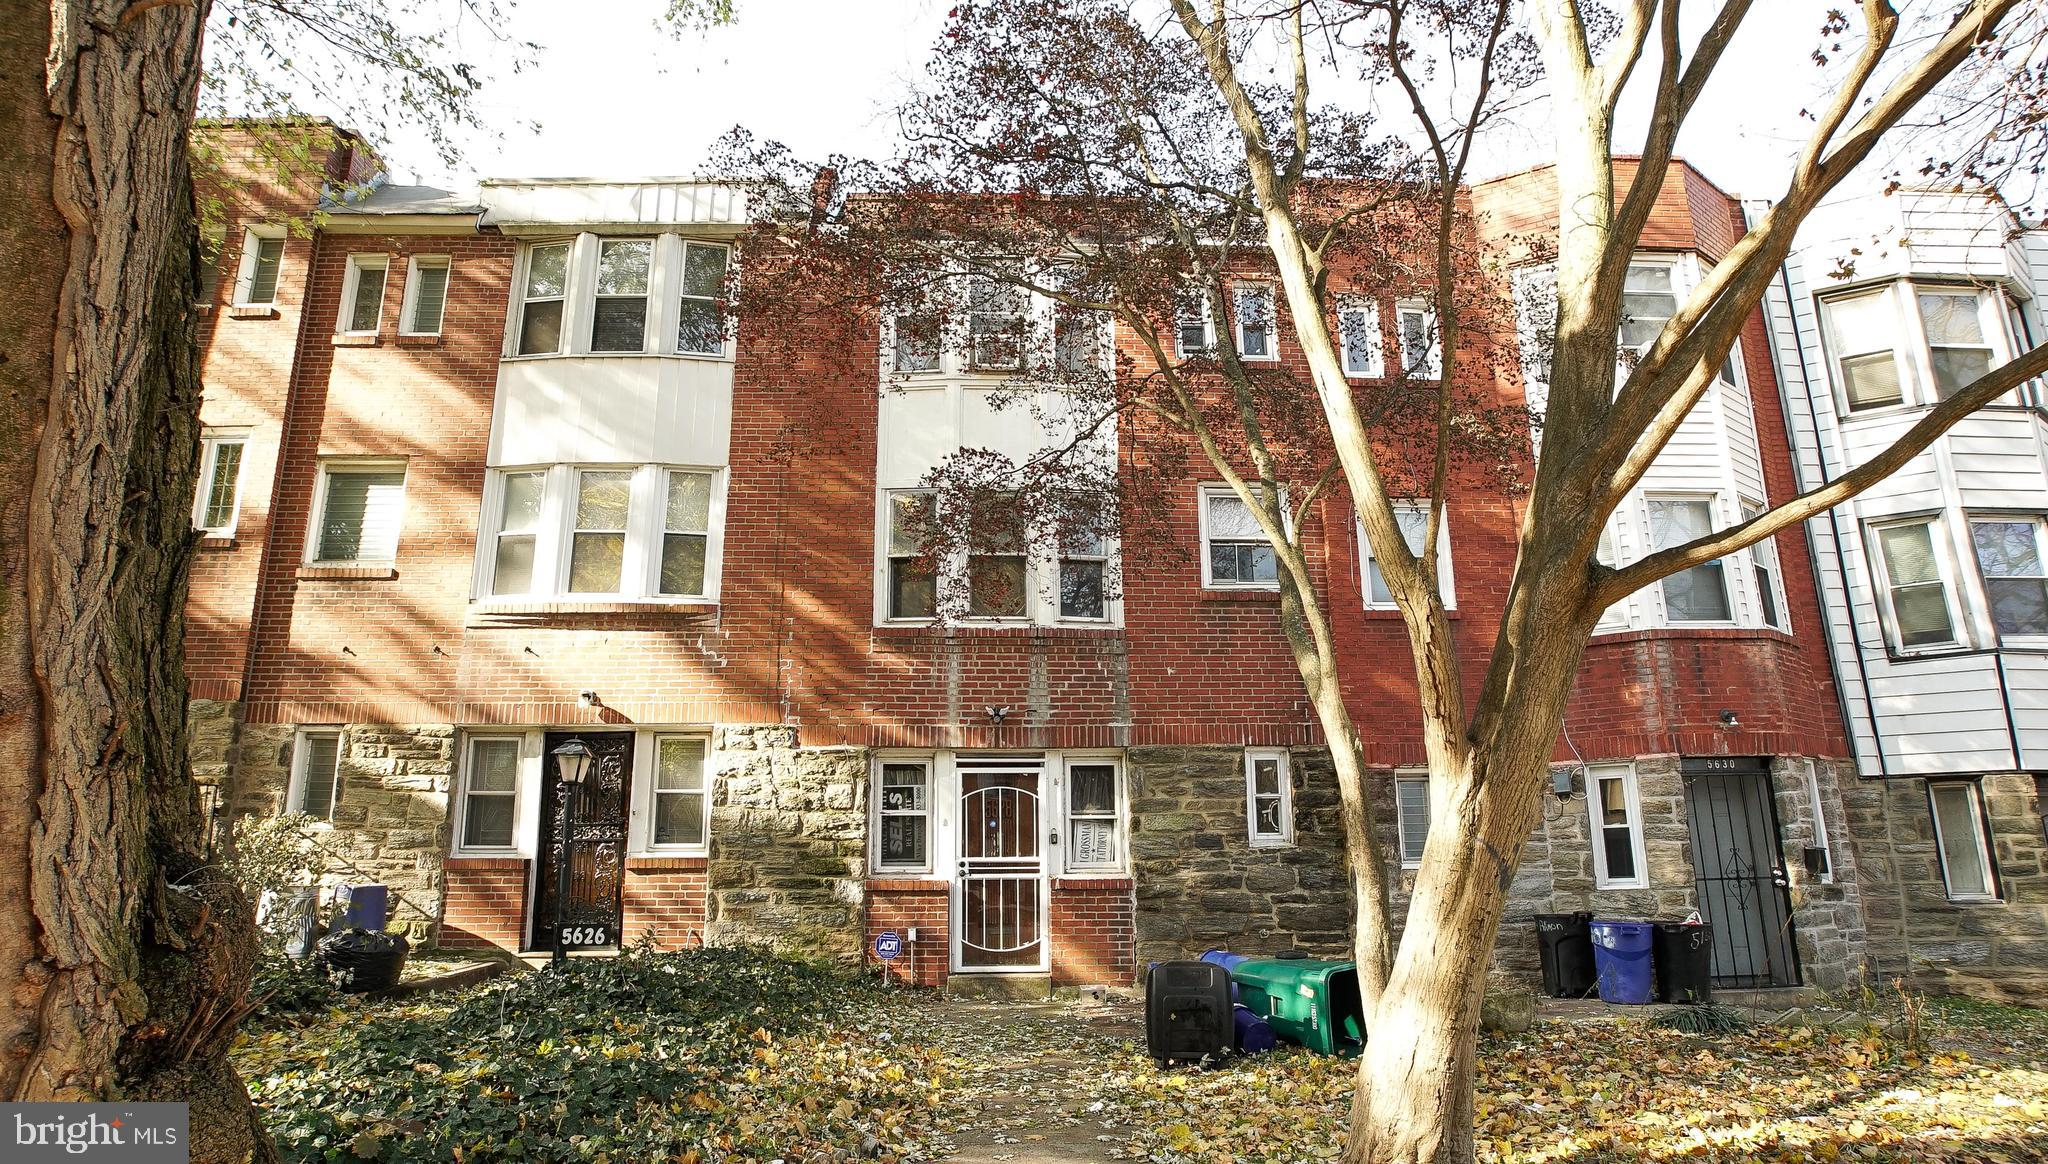 5628 N 18Th Street, Philadelphia, PA 19141